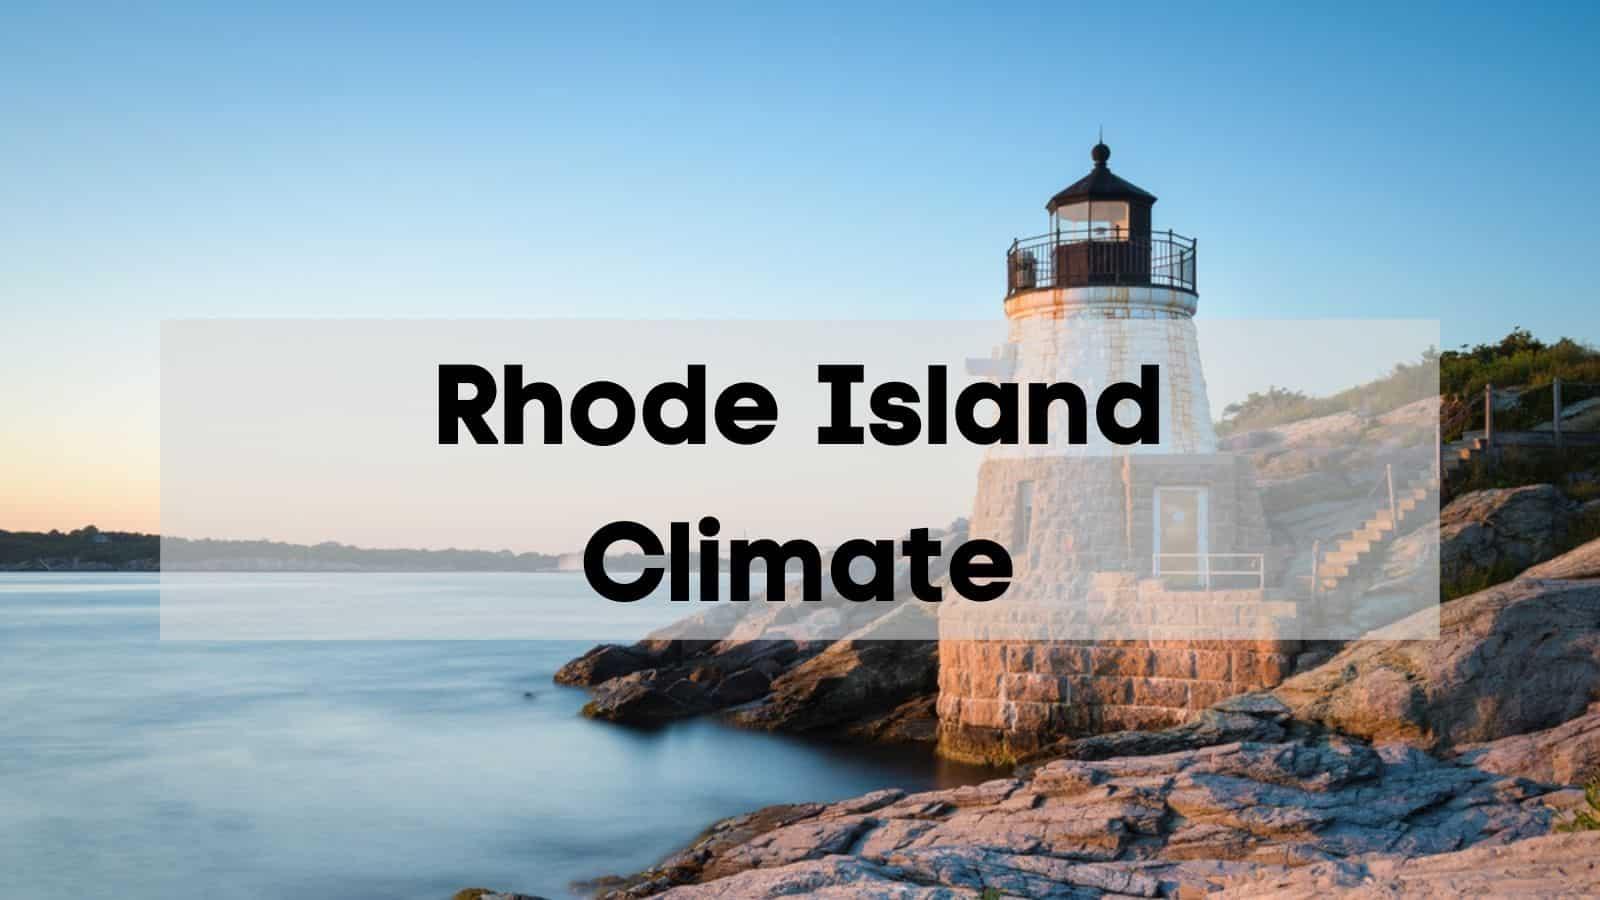 rhode island climate